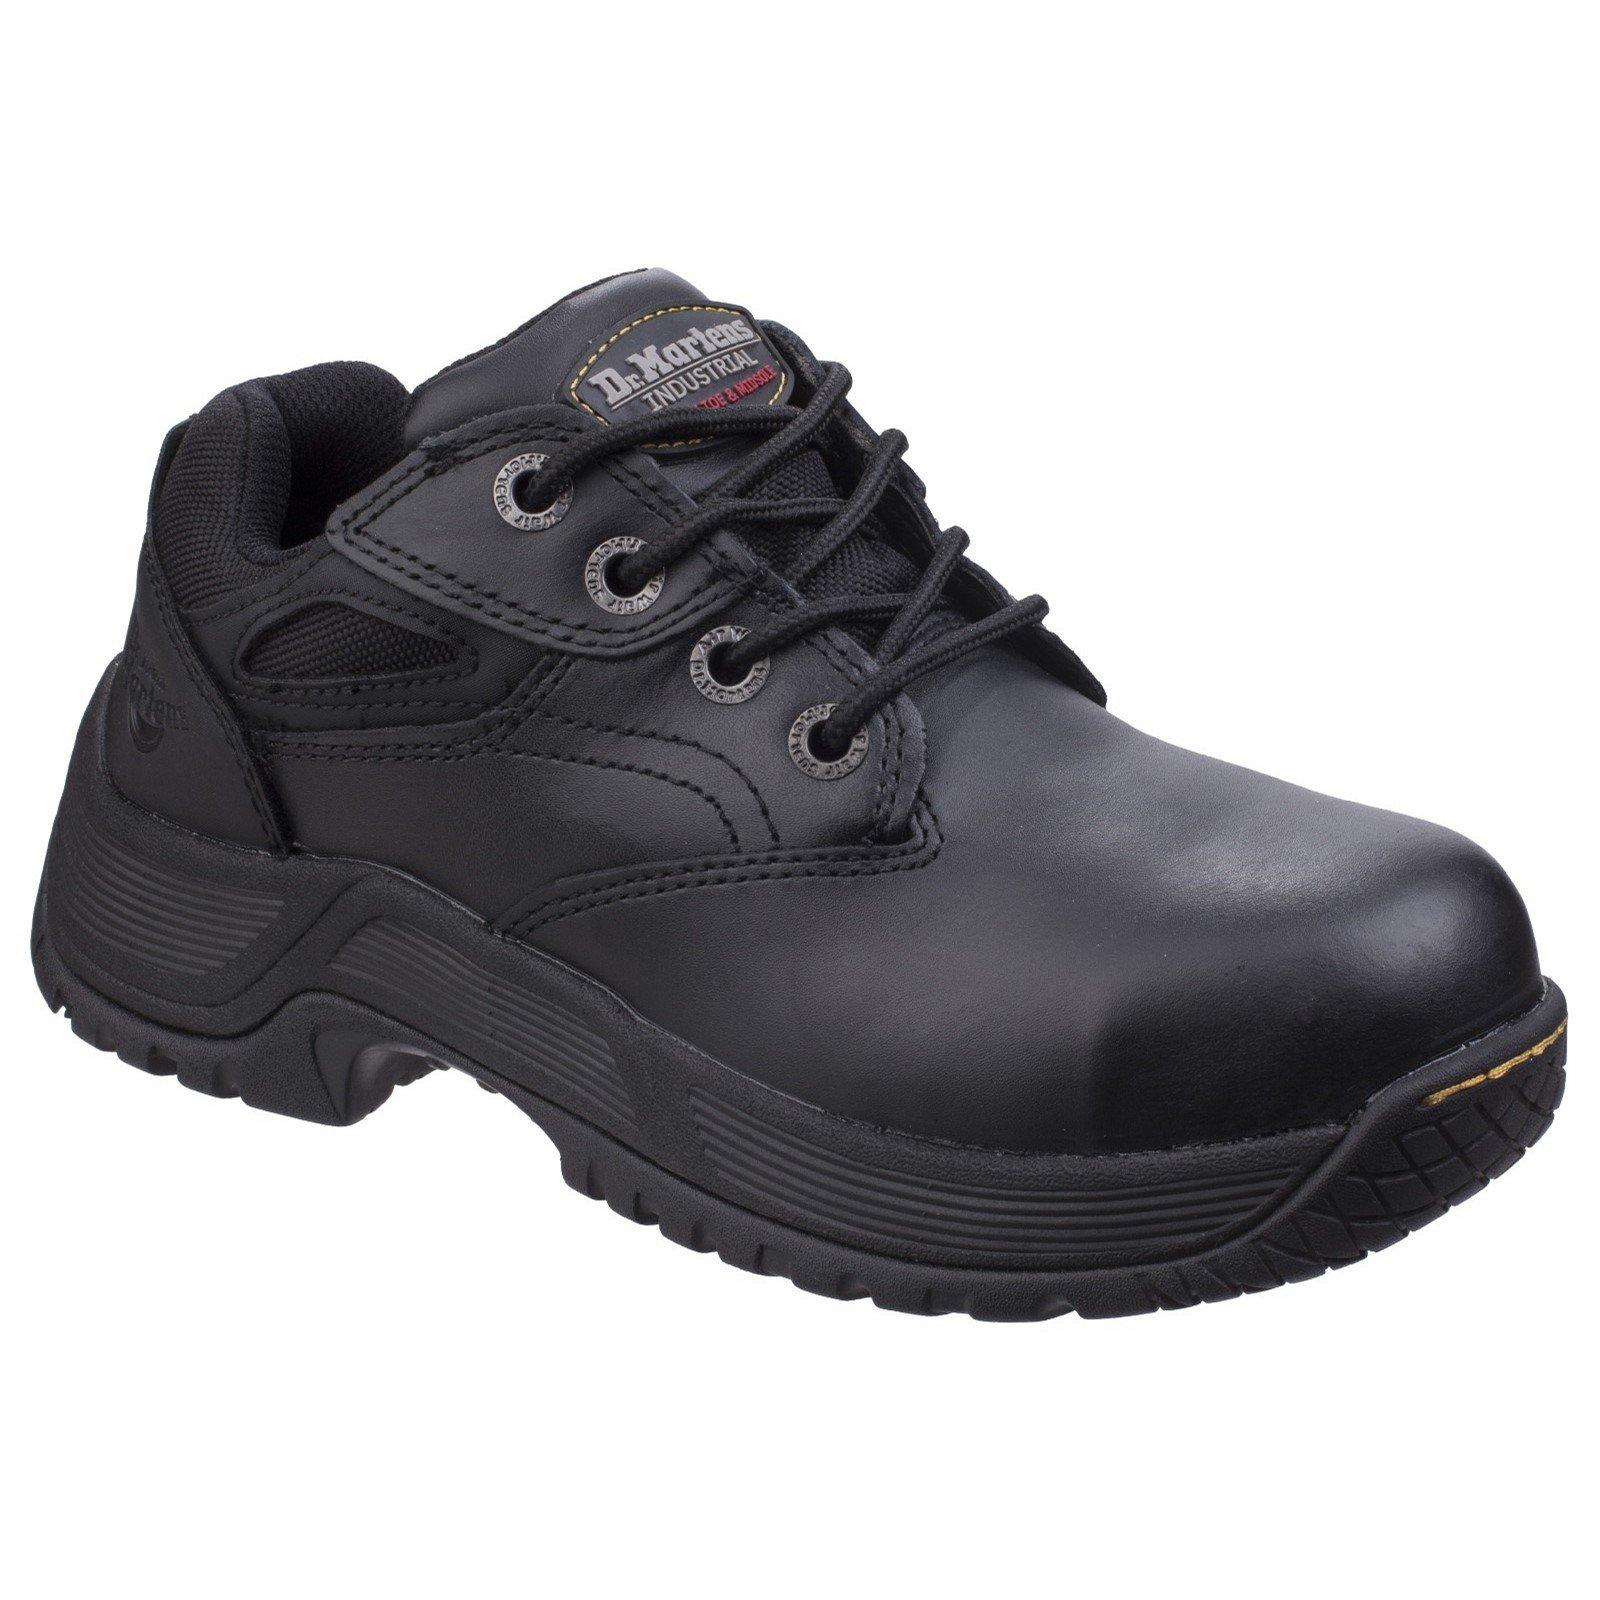 Dr Martens Unisex Calvert Steel Toe Safety Trainer Black 26022 - Black 9